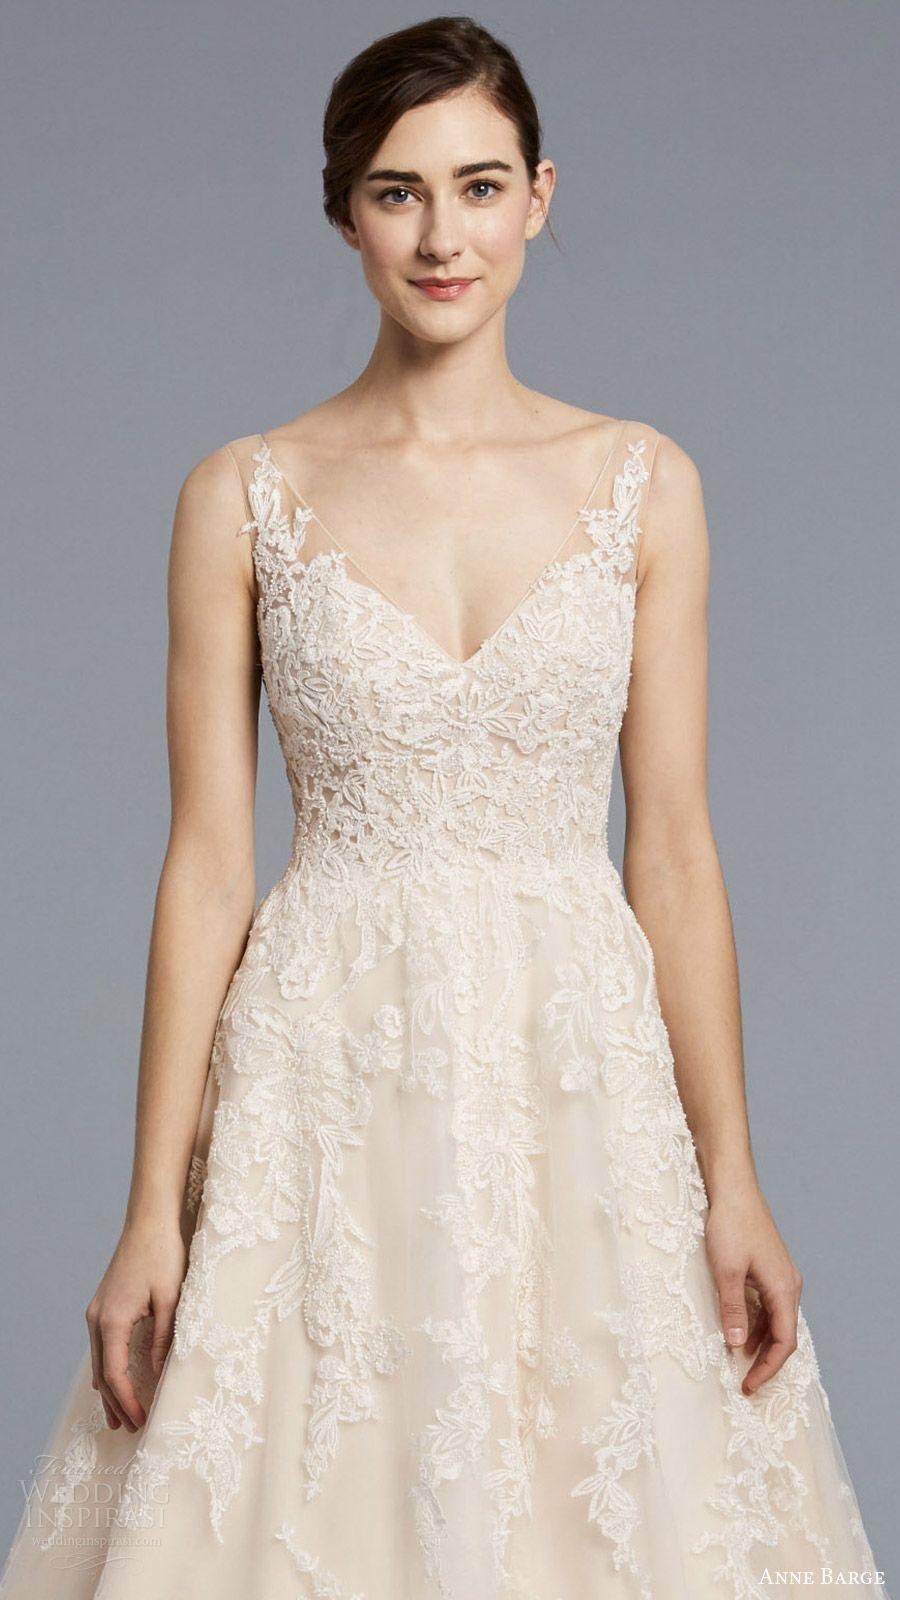 0e85767f89 anne barge spring 2018 bridal sleeveless illusion straps v neck sheer  beaded lace bodice a line wedding dress (camelot) zfv